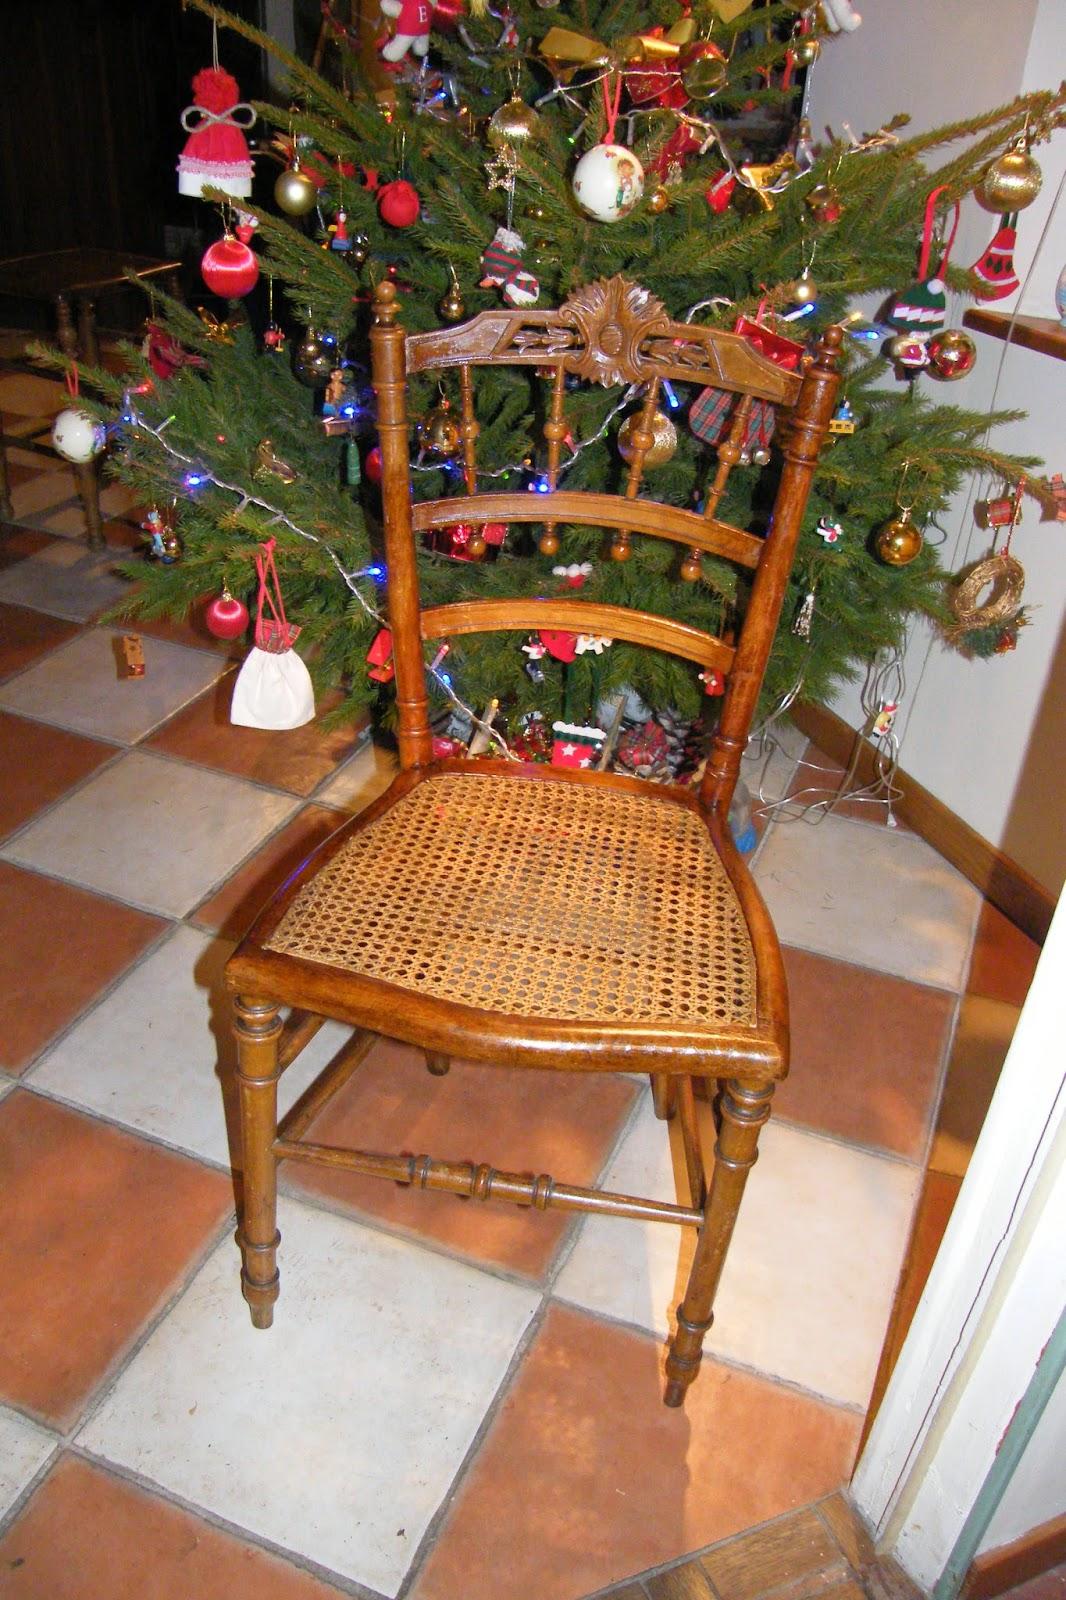 normandie cannage chaise cann e napol on iii de paris. Black Bedroom Furniture Sets. Home Design Ideas